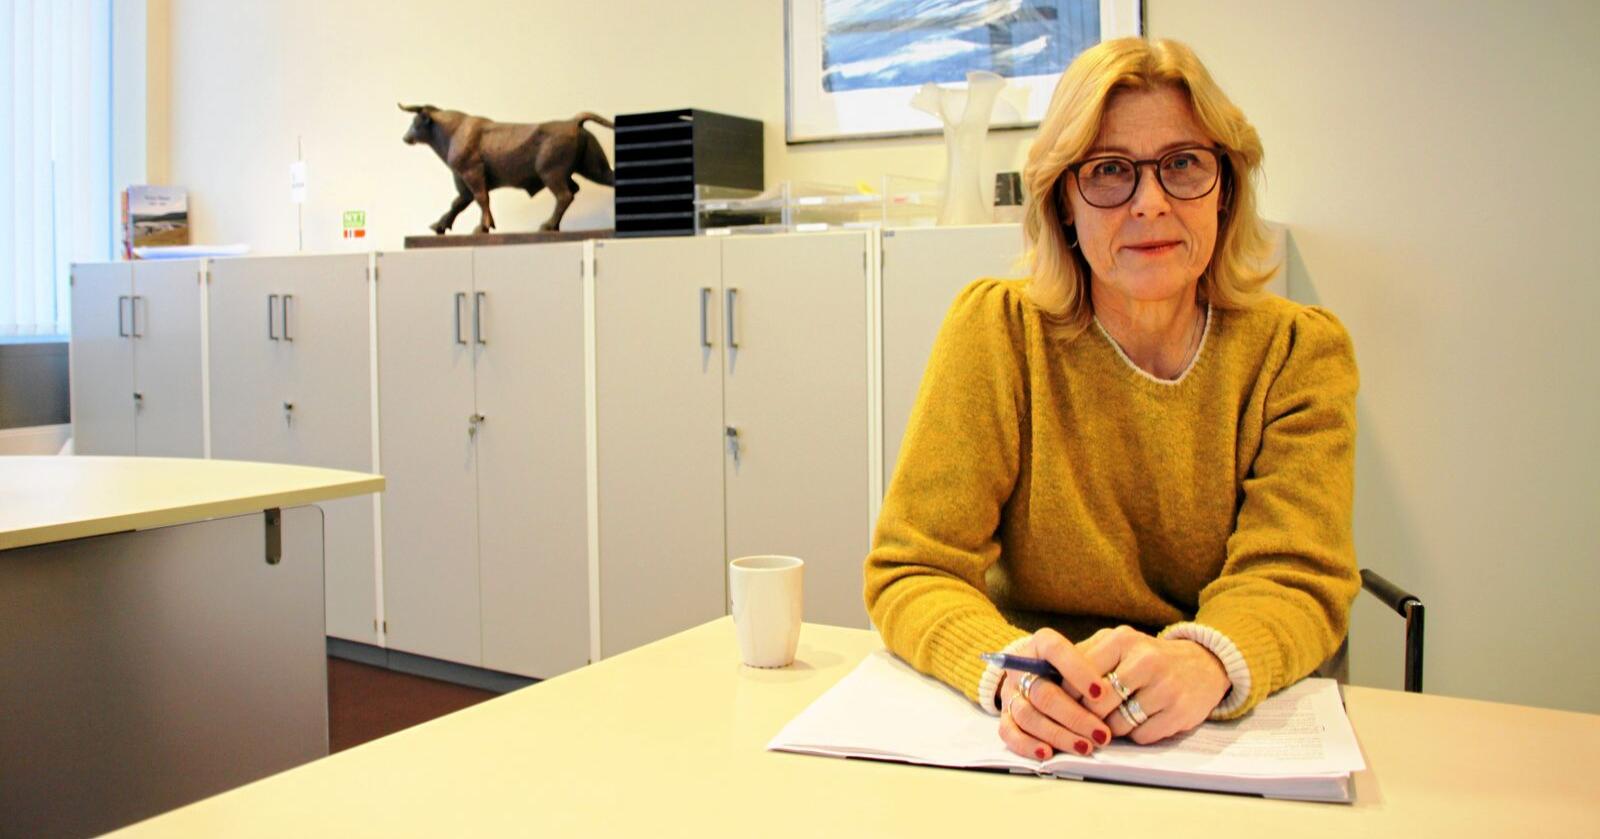 Skal snu Nortura-skuta: Anne Marit Panengstuen er konsernsjef i Nortura. Foto: Christiane Jordheim Larsen